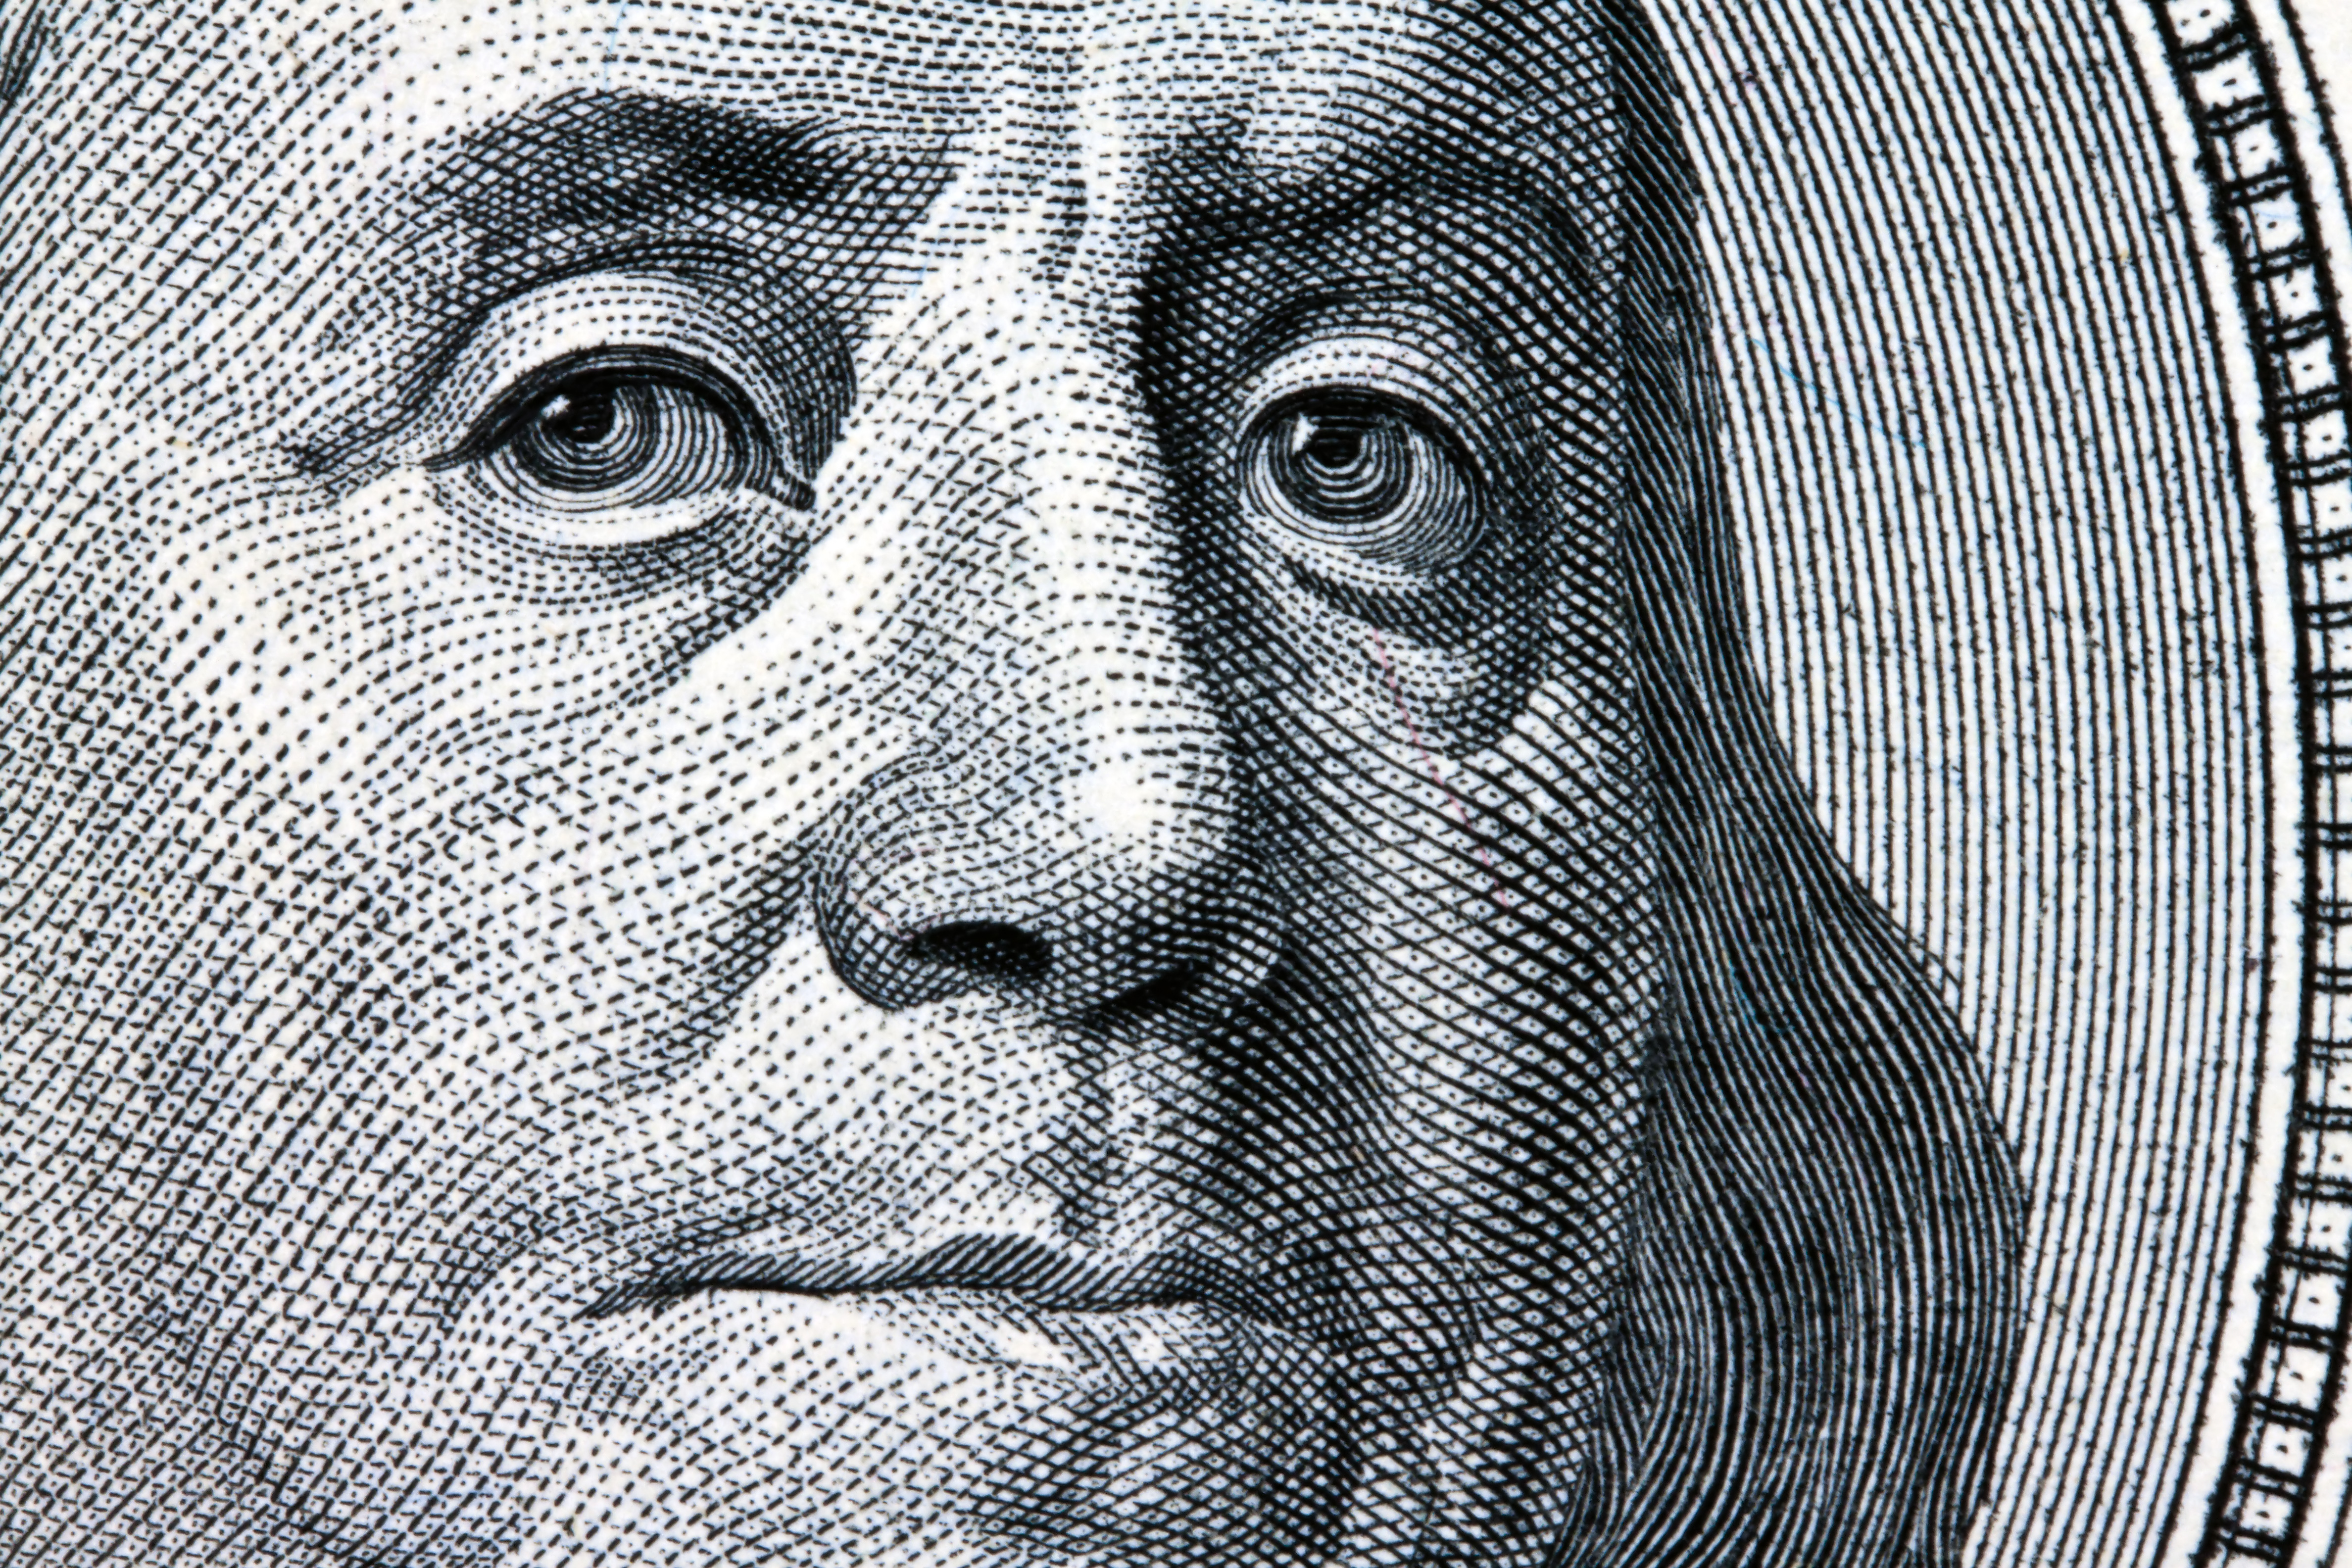 Washington on dollar note